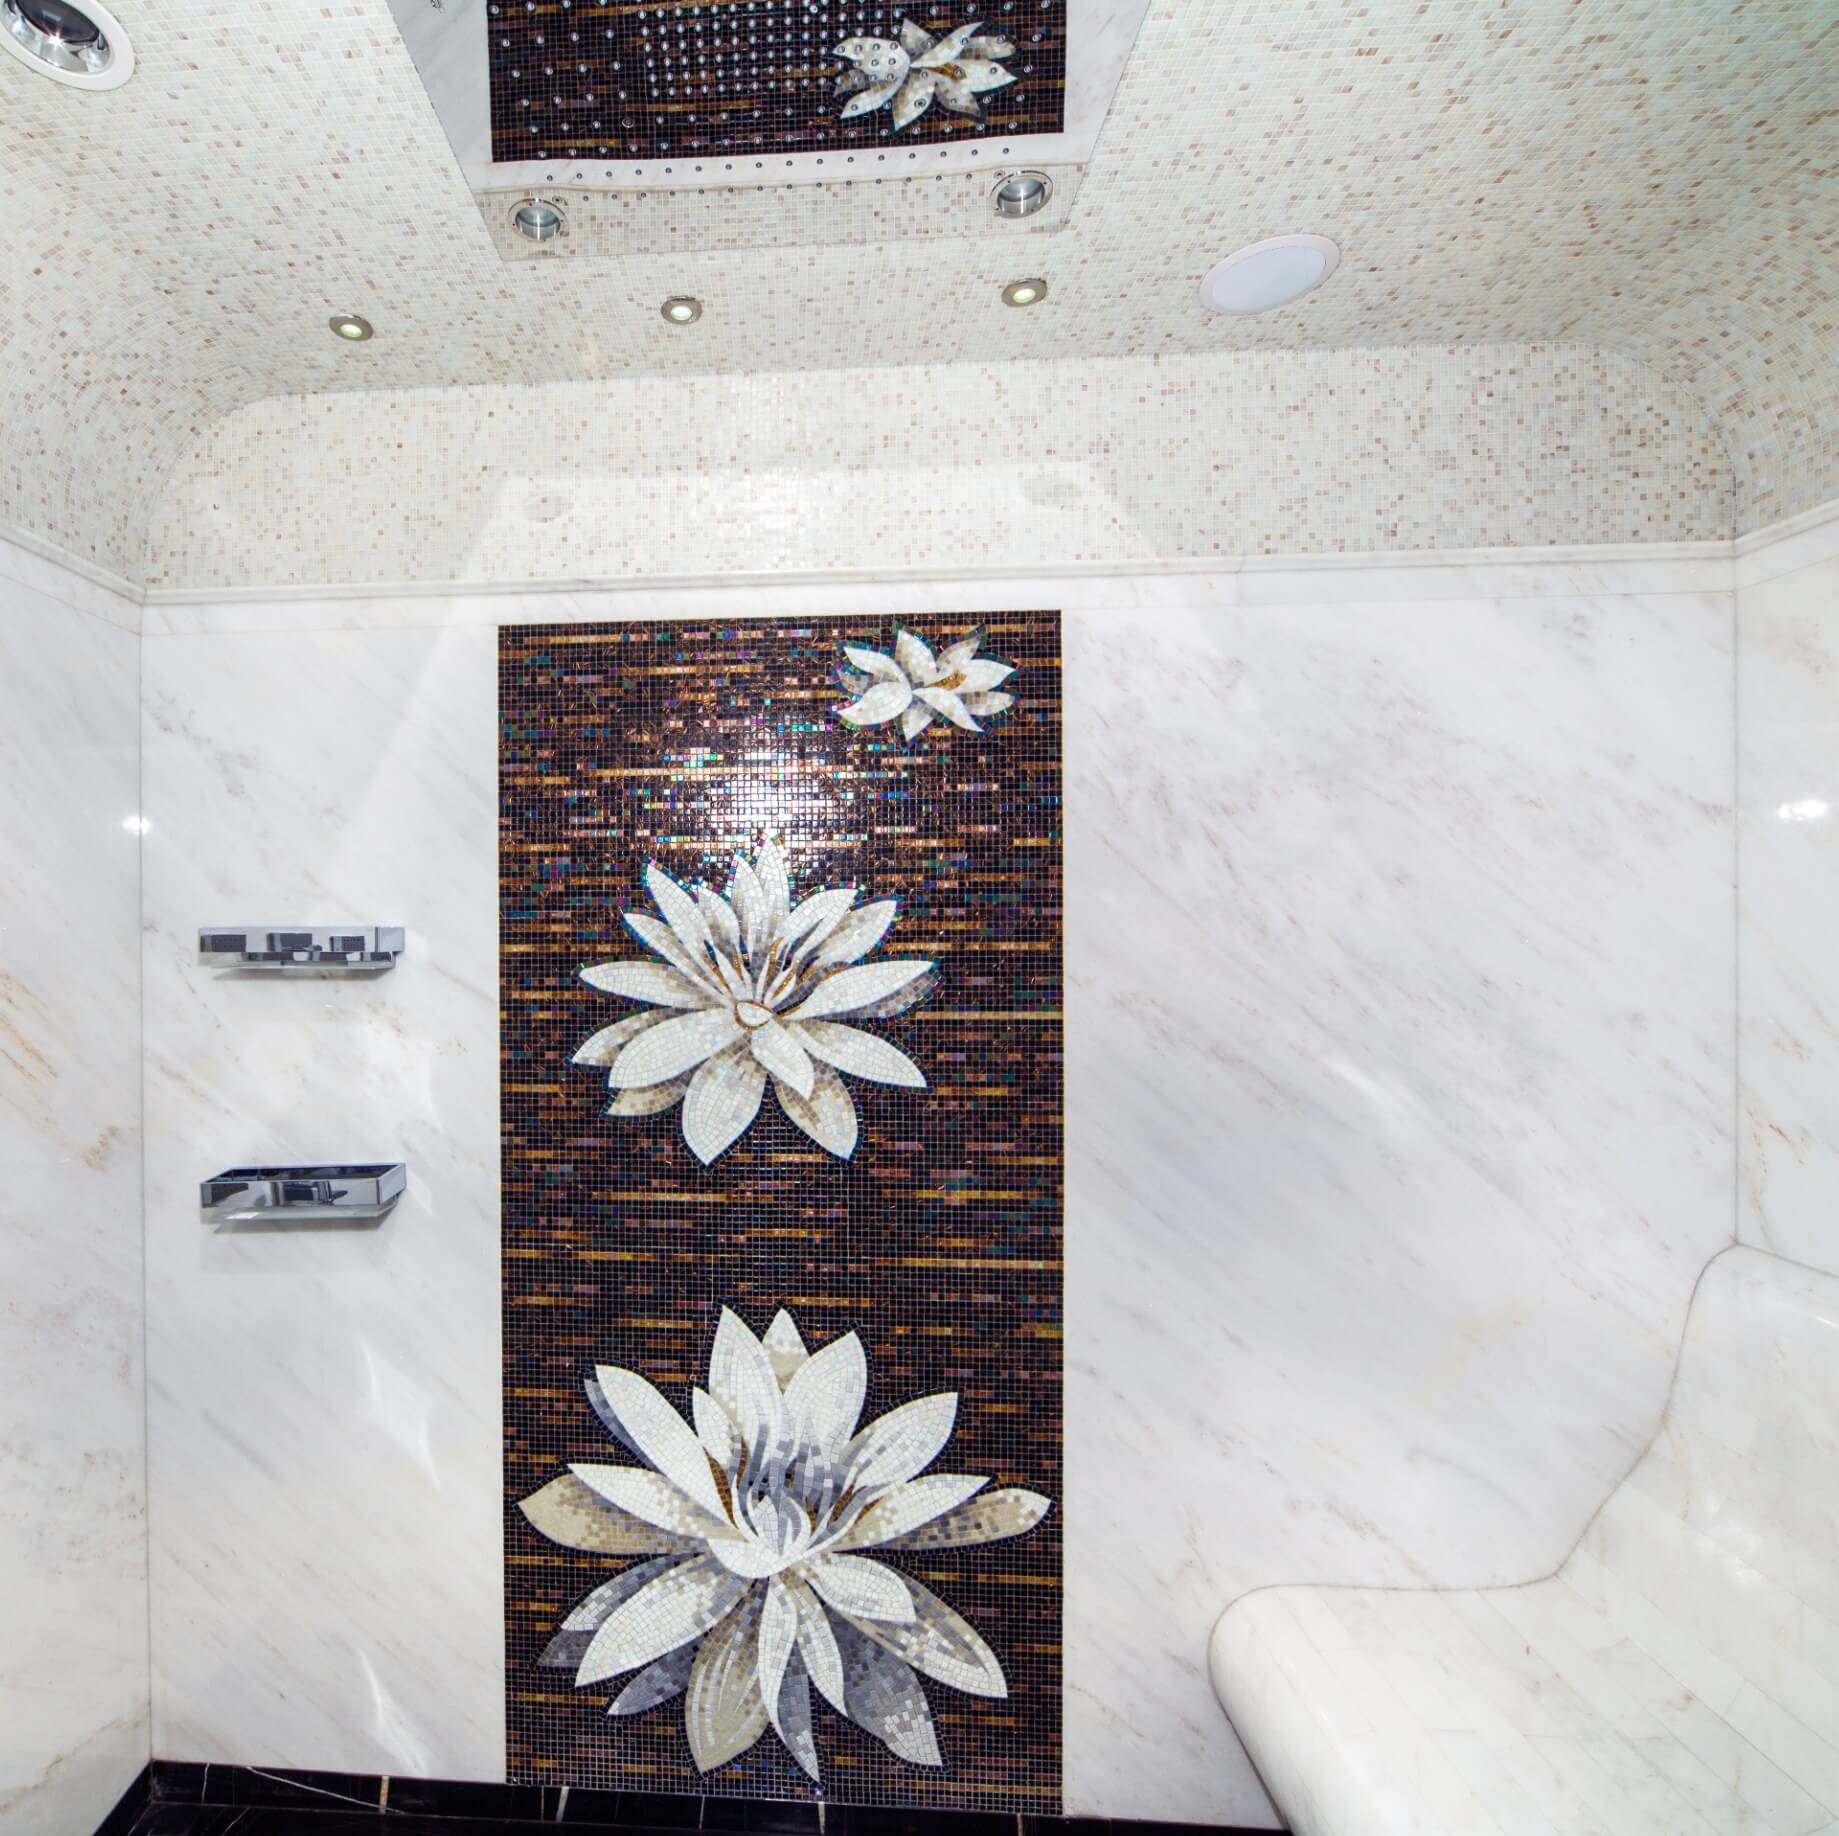 Фотография Ванная комната Госдачи №9, Мухолатка, Крым 1